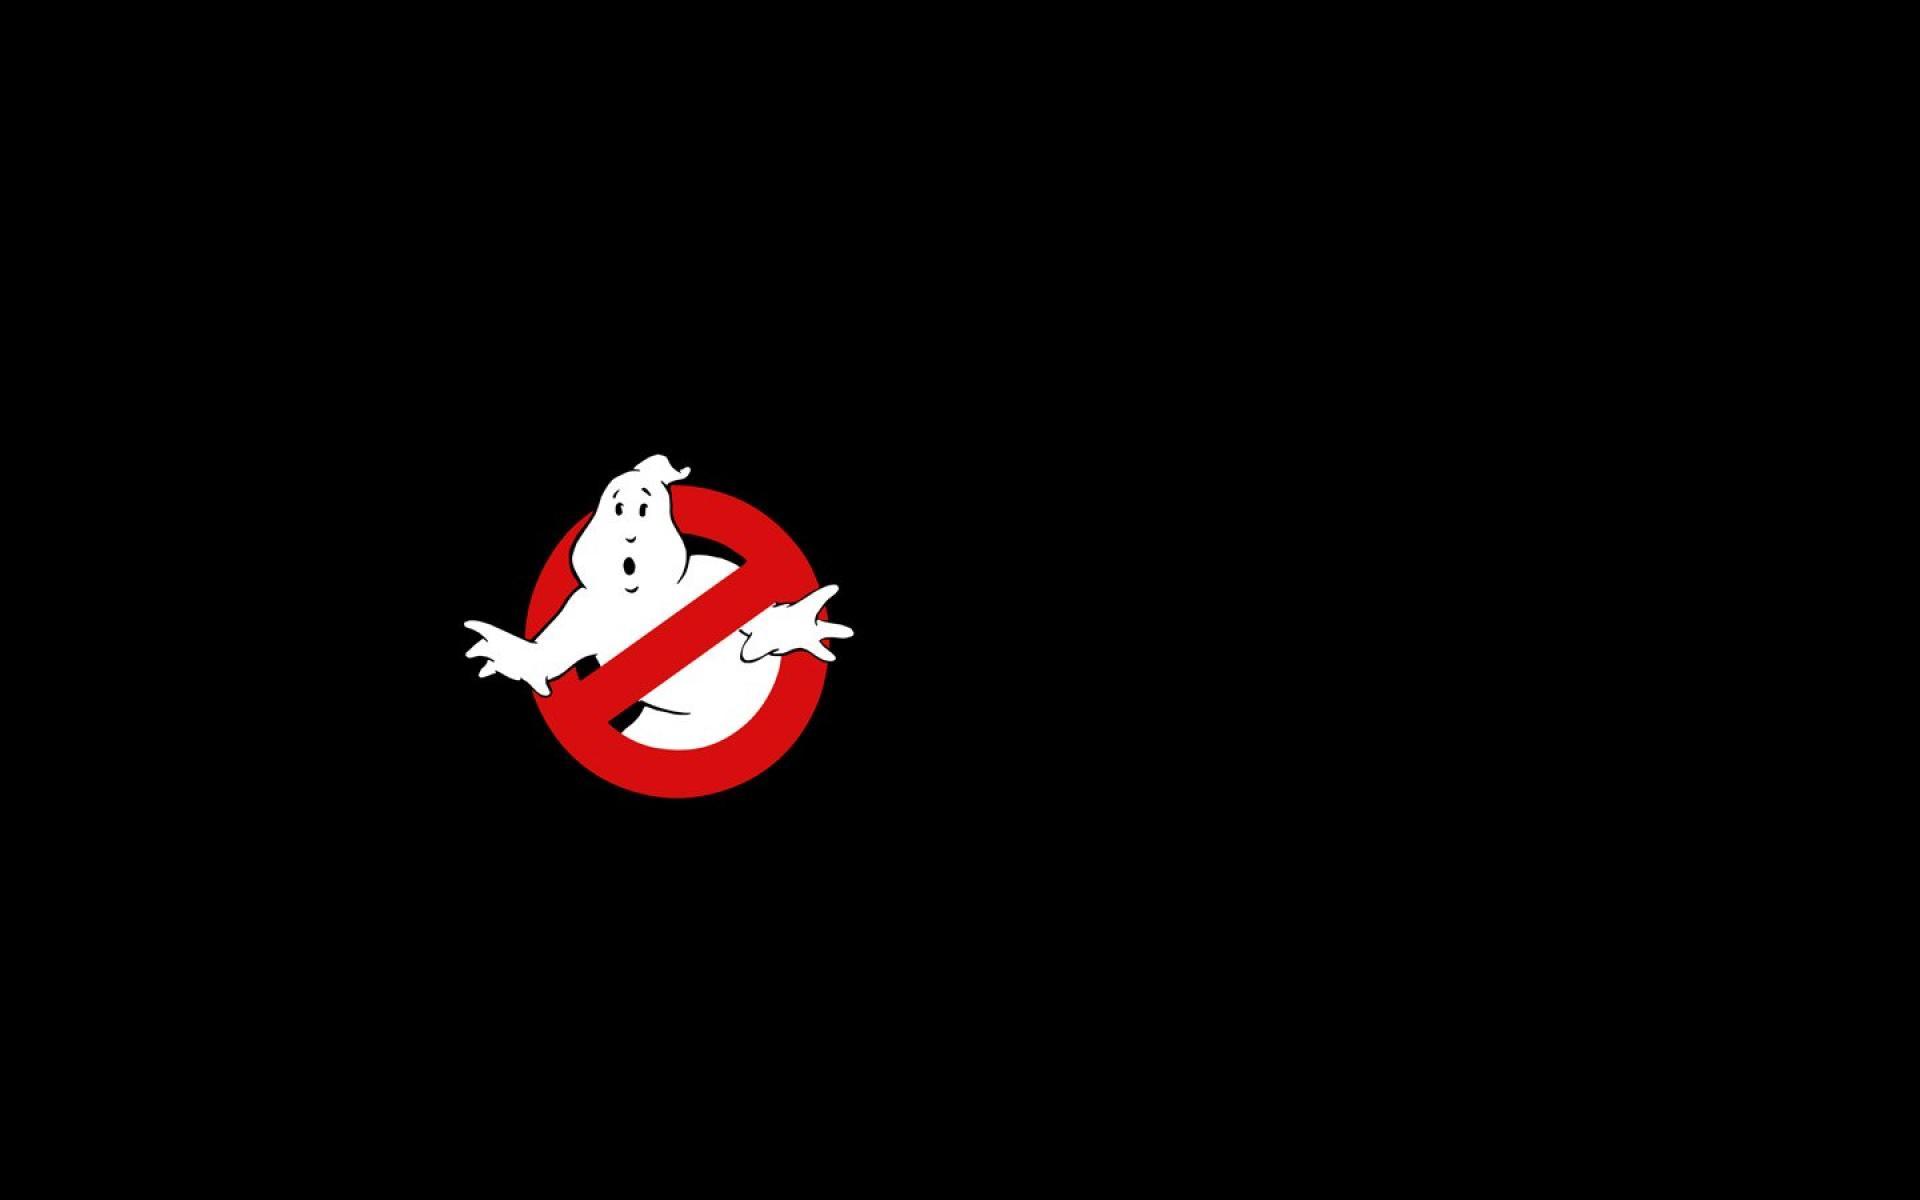 Ghostbusters 3 Wallpaper Ghostbusters Wallpaper...